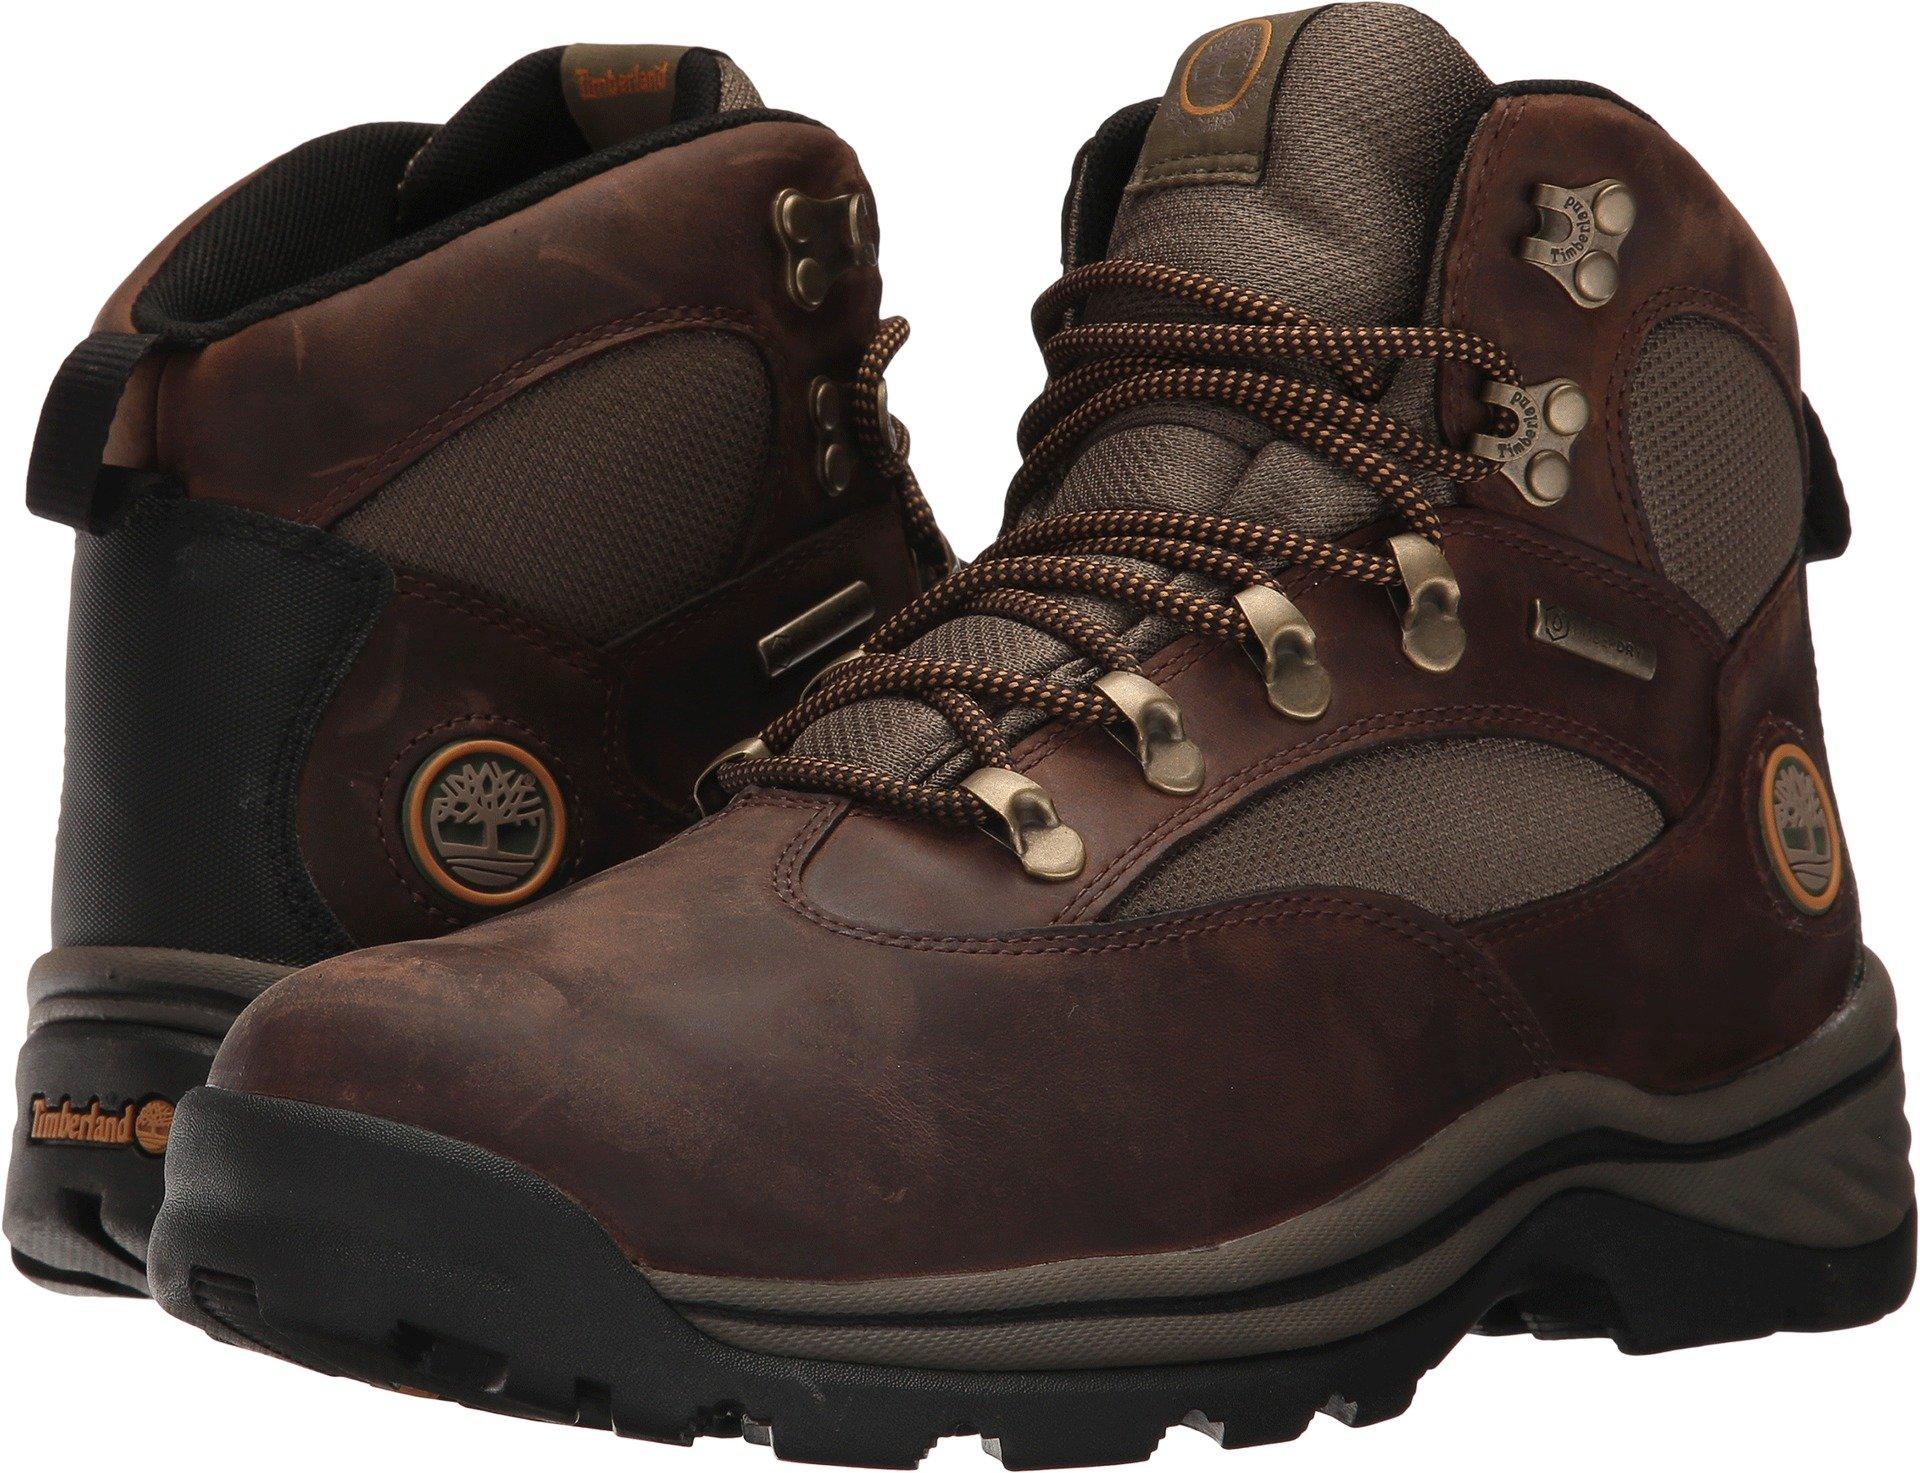 43032e23cf7 Timberland Men's Chocorua Trail Waterproof Hiking Boot,Brown w/Green,US 13 M